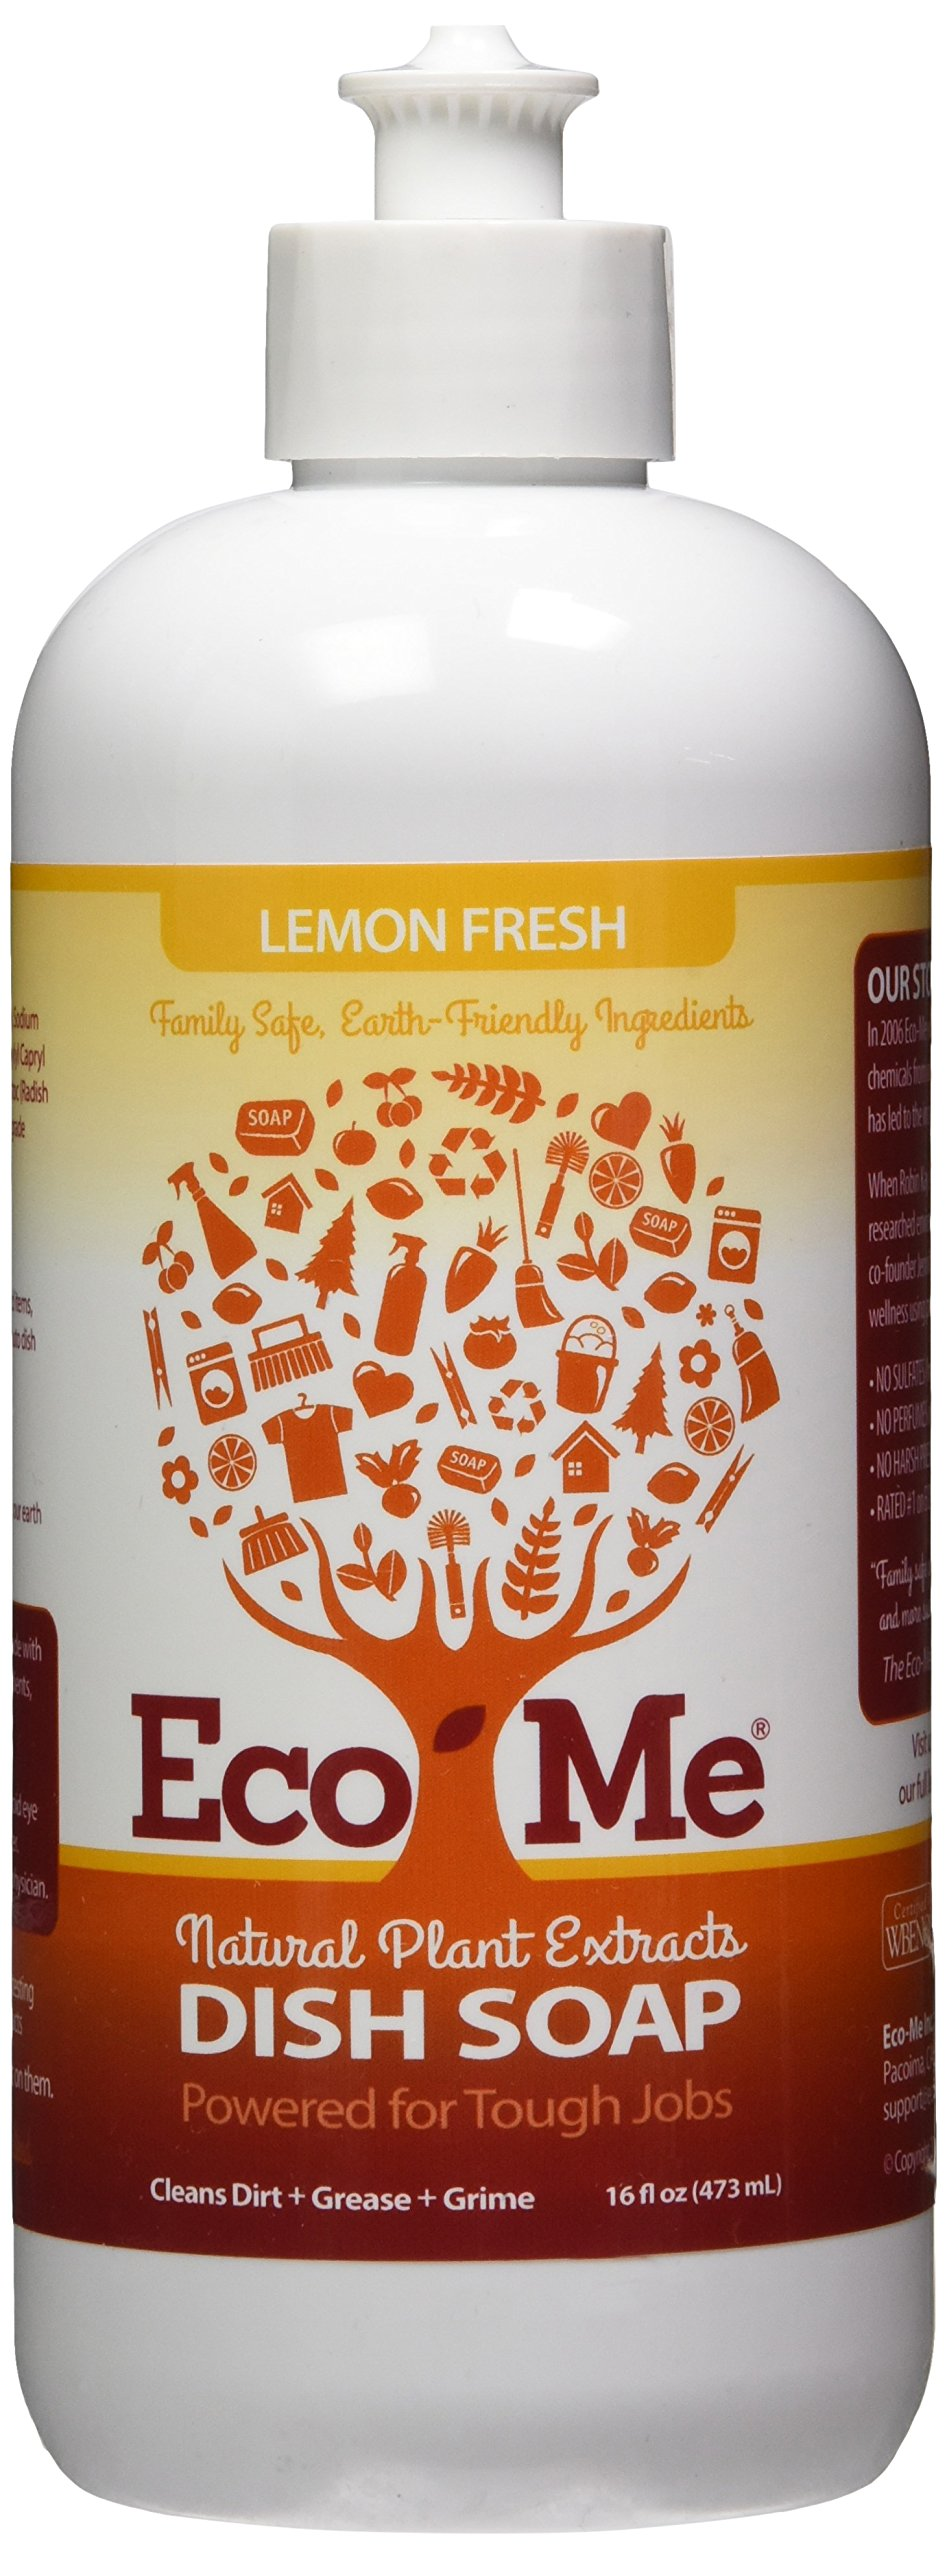 Eco Me Natural Environmentally Friendly Sudsing Liquid Dish Soap, Healthy Lemon Fresh Scent, 16 Ounce Bottle, Pack of 6